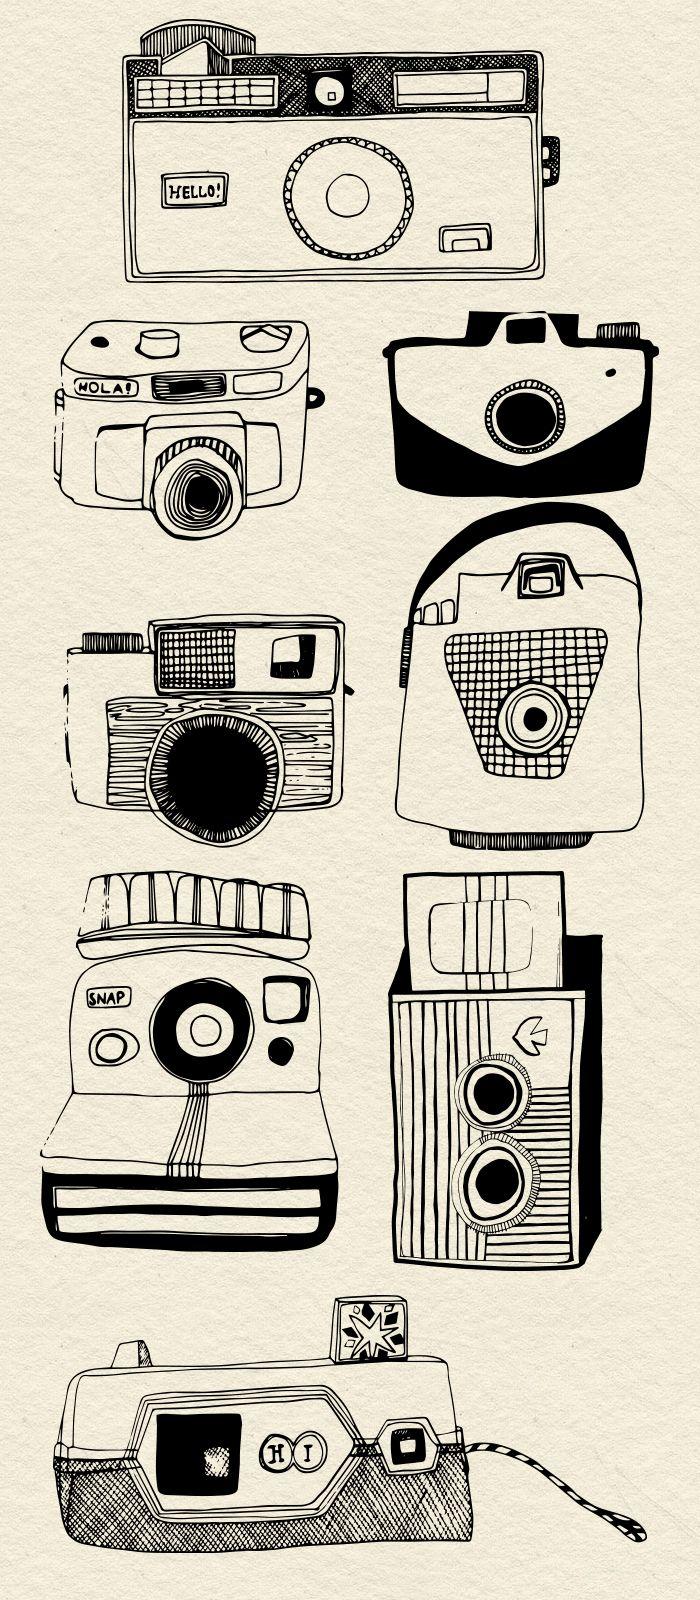 #Illustration www.kidsdinge.com    www.facebook.com/pages/kidsdingecom-Origineel-speelgoed-hebbedingen-voor-hippe-kids/160122710686387?sk=wall        http://instagram.com/kidsdinge